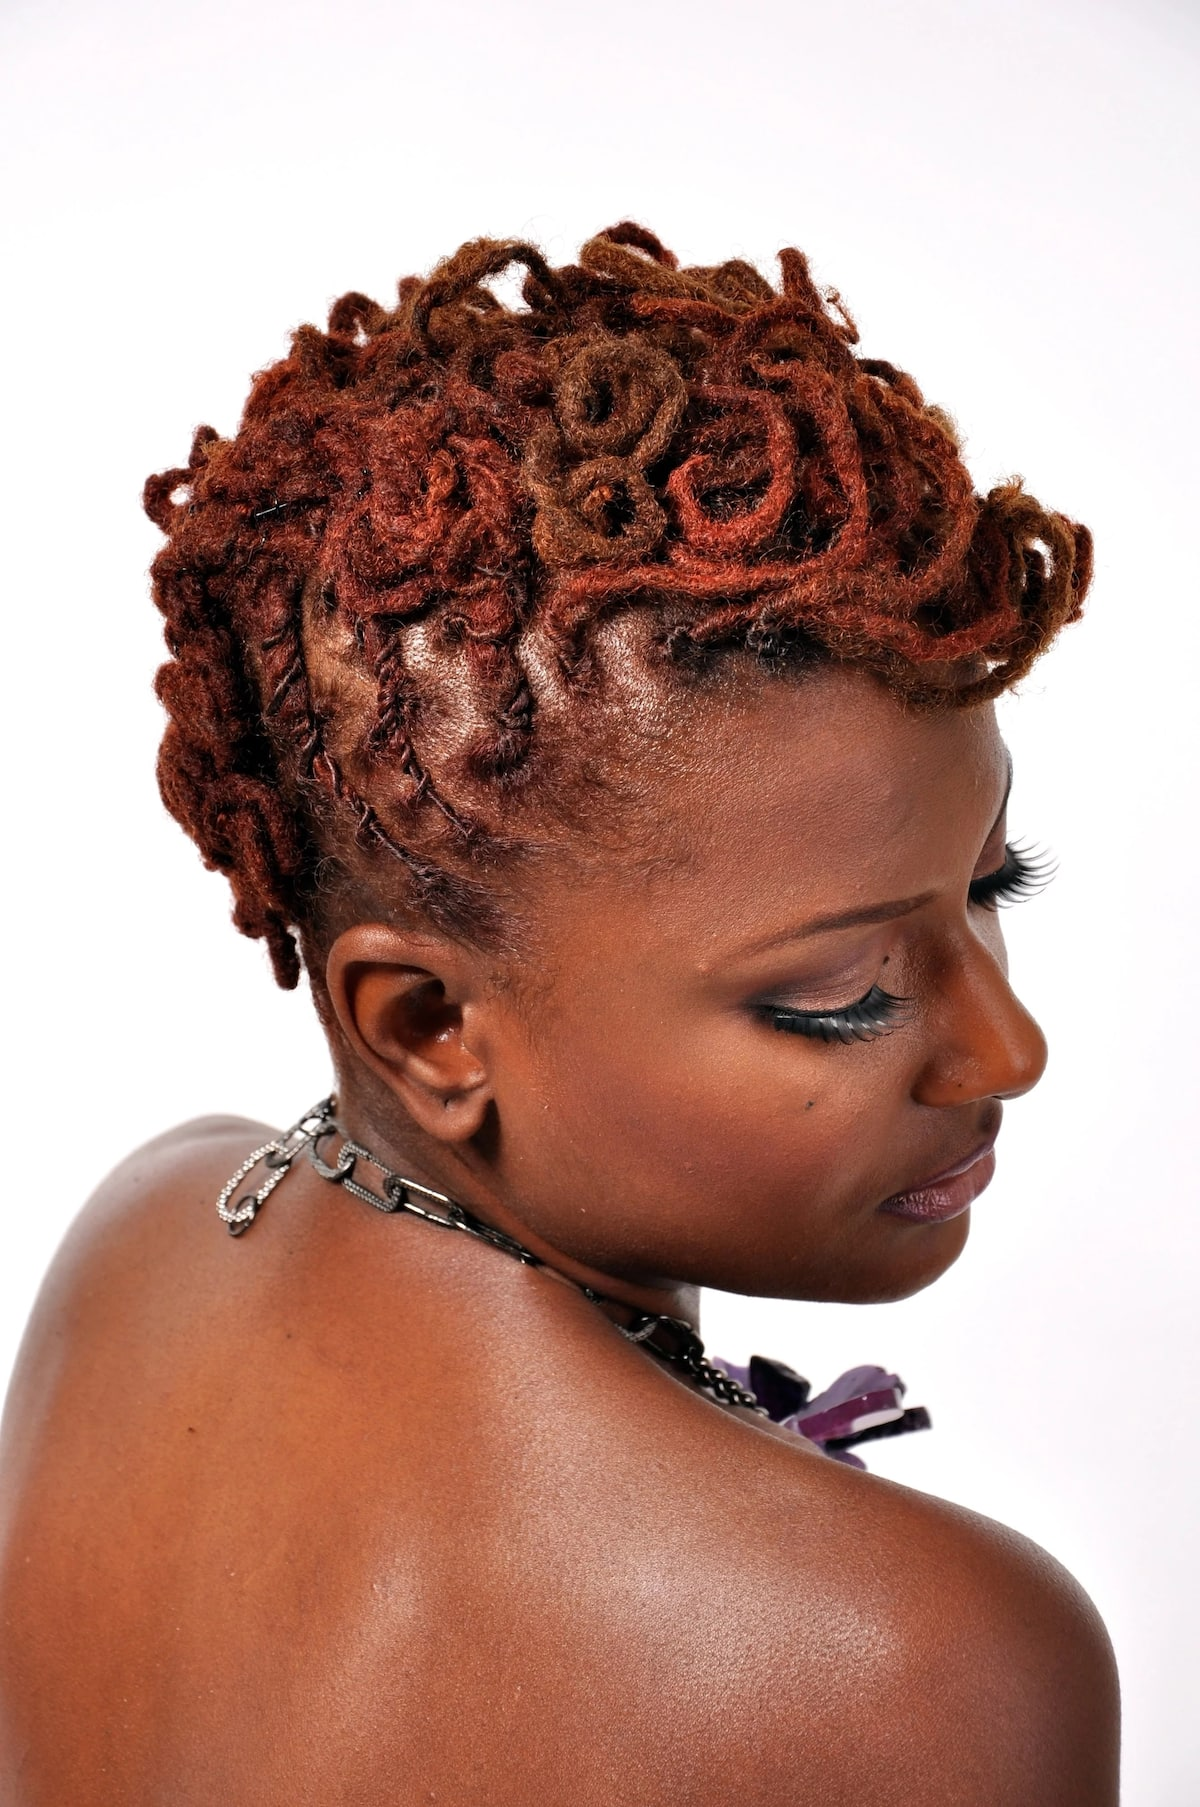 Dreadlock styles for short hair in Nigeria for 2018 Legit.ng